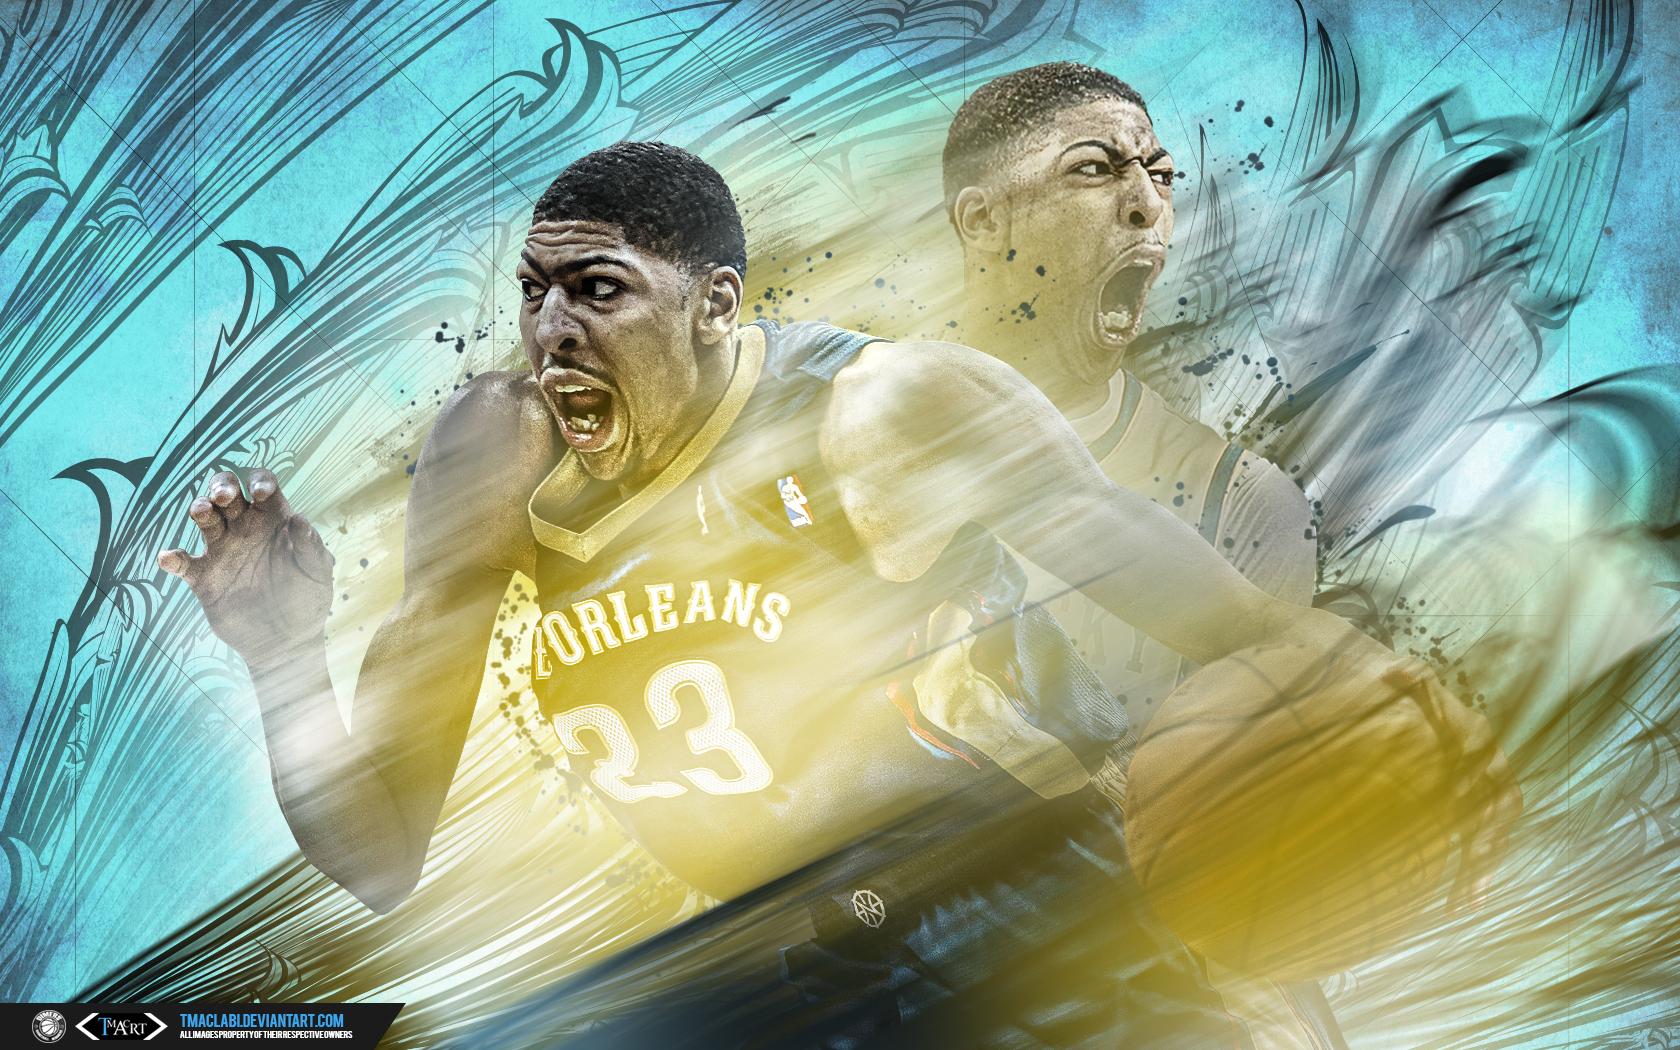 Anthony Davis puts NBA on quadruple-double watch   ProBasketballTalk